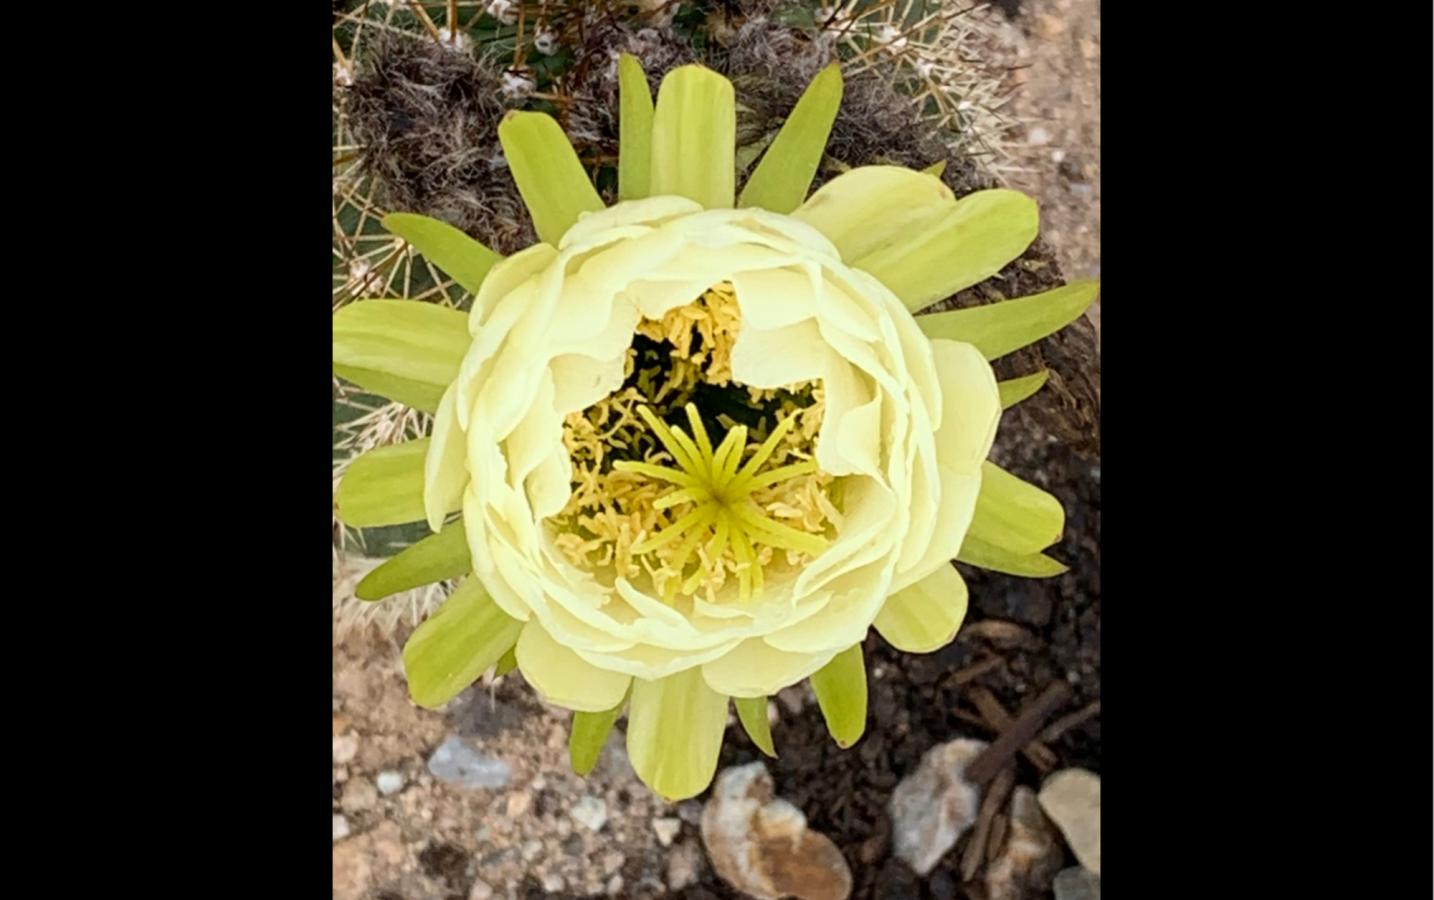 Cactus flower --Cindy Wang